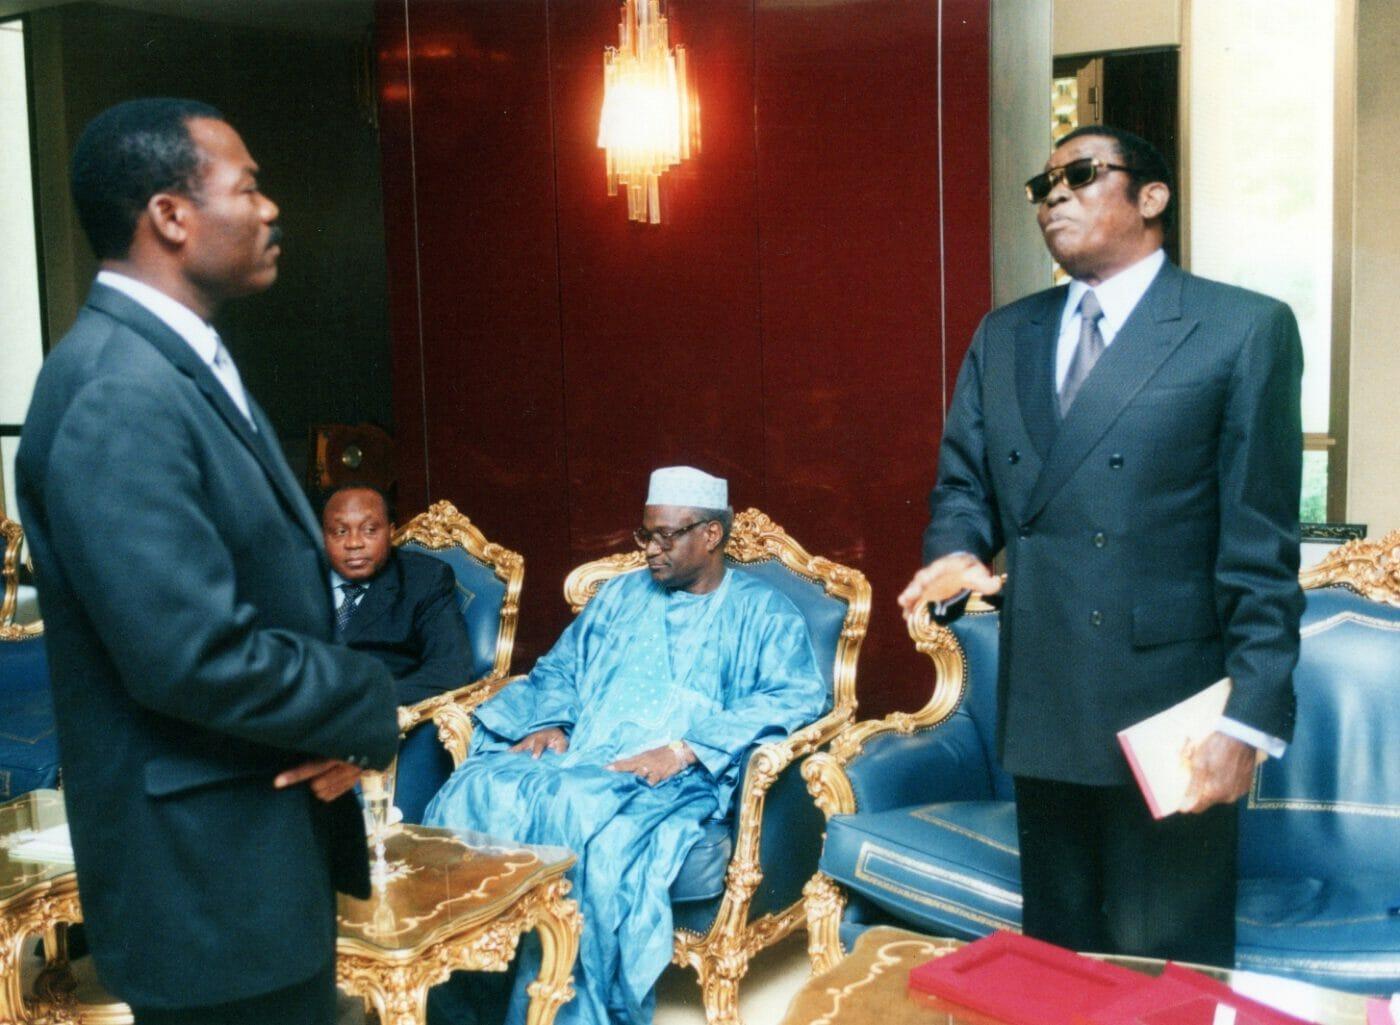 Soumanou Salifou with Togo's President Gnassingbe Eyadema